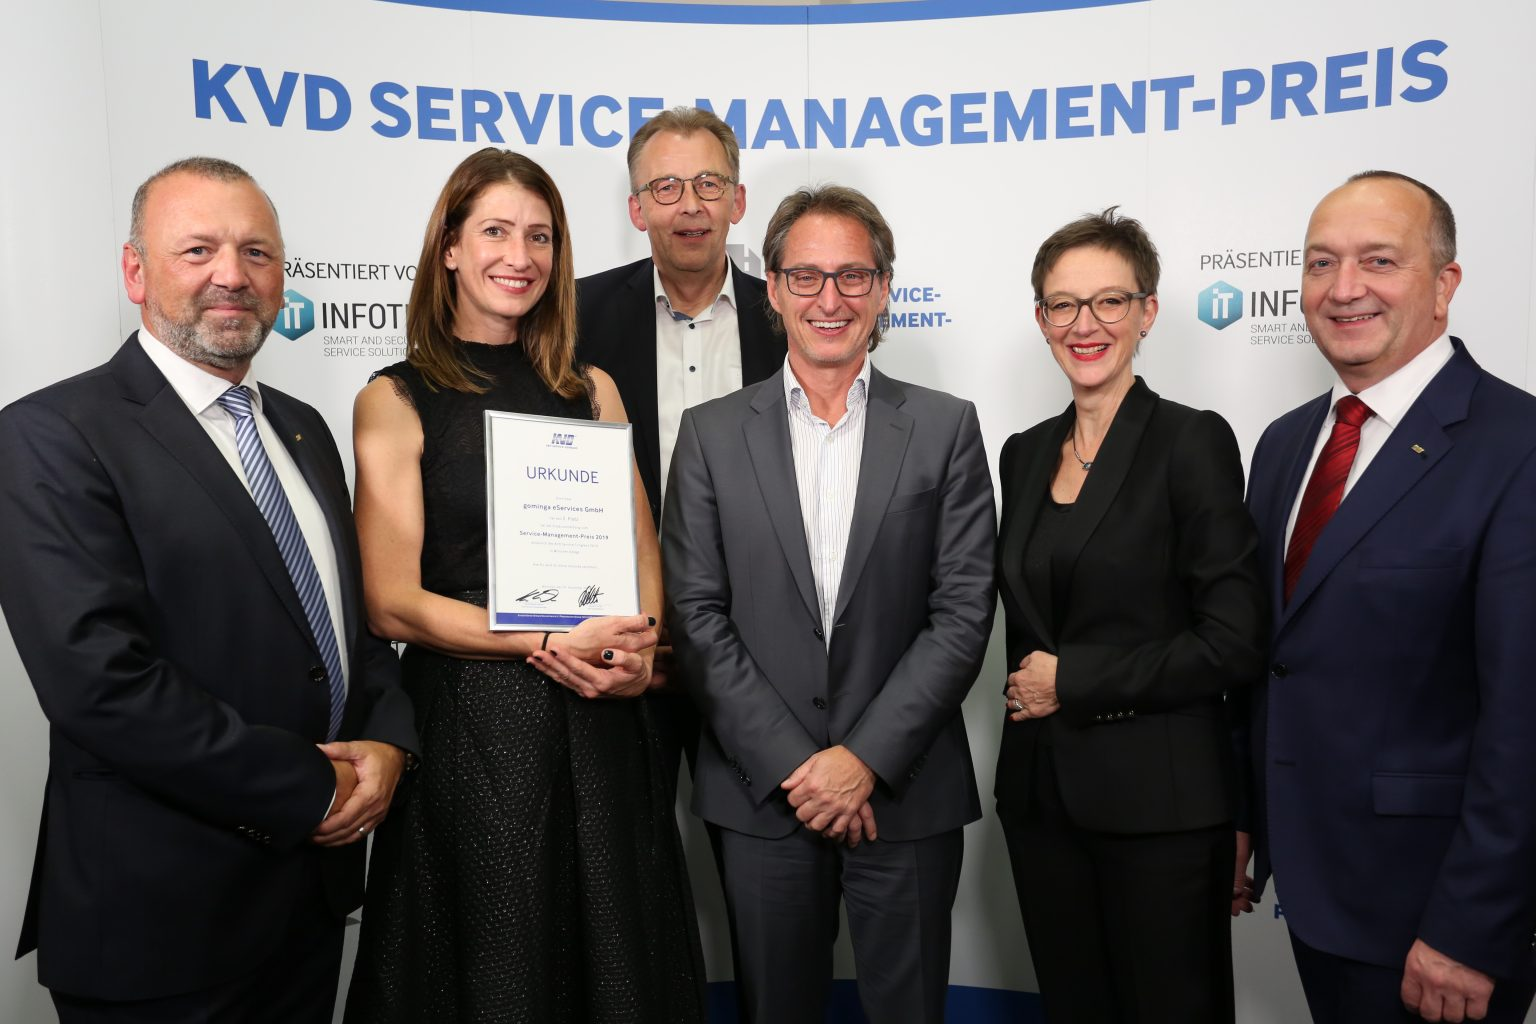 gominga – prize winner at the KVD Service Management Award 2019!